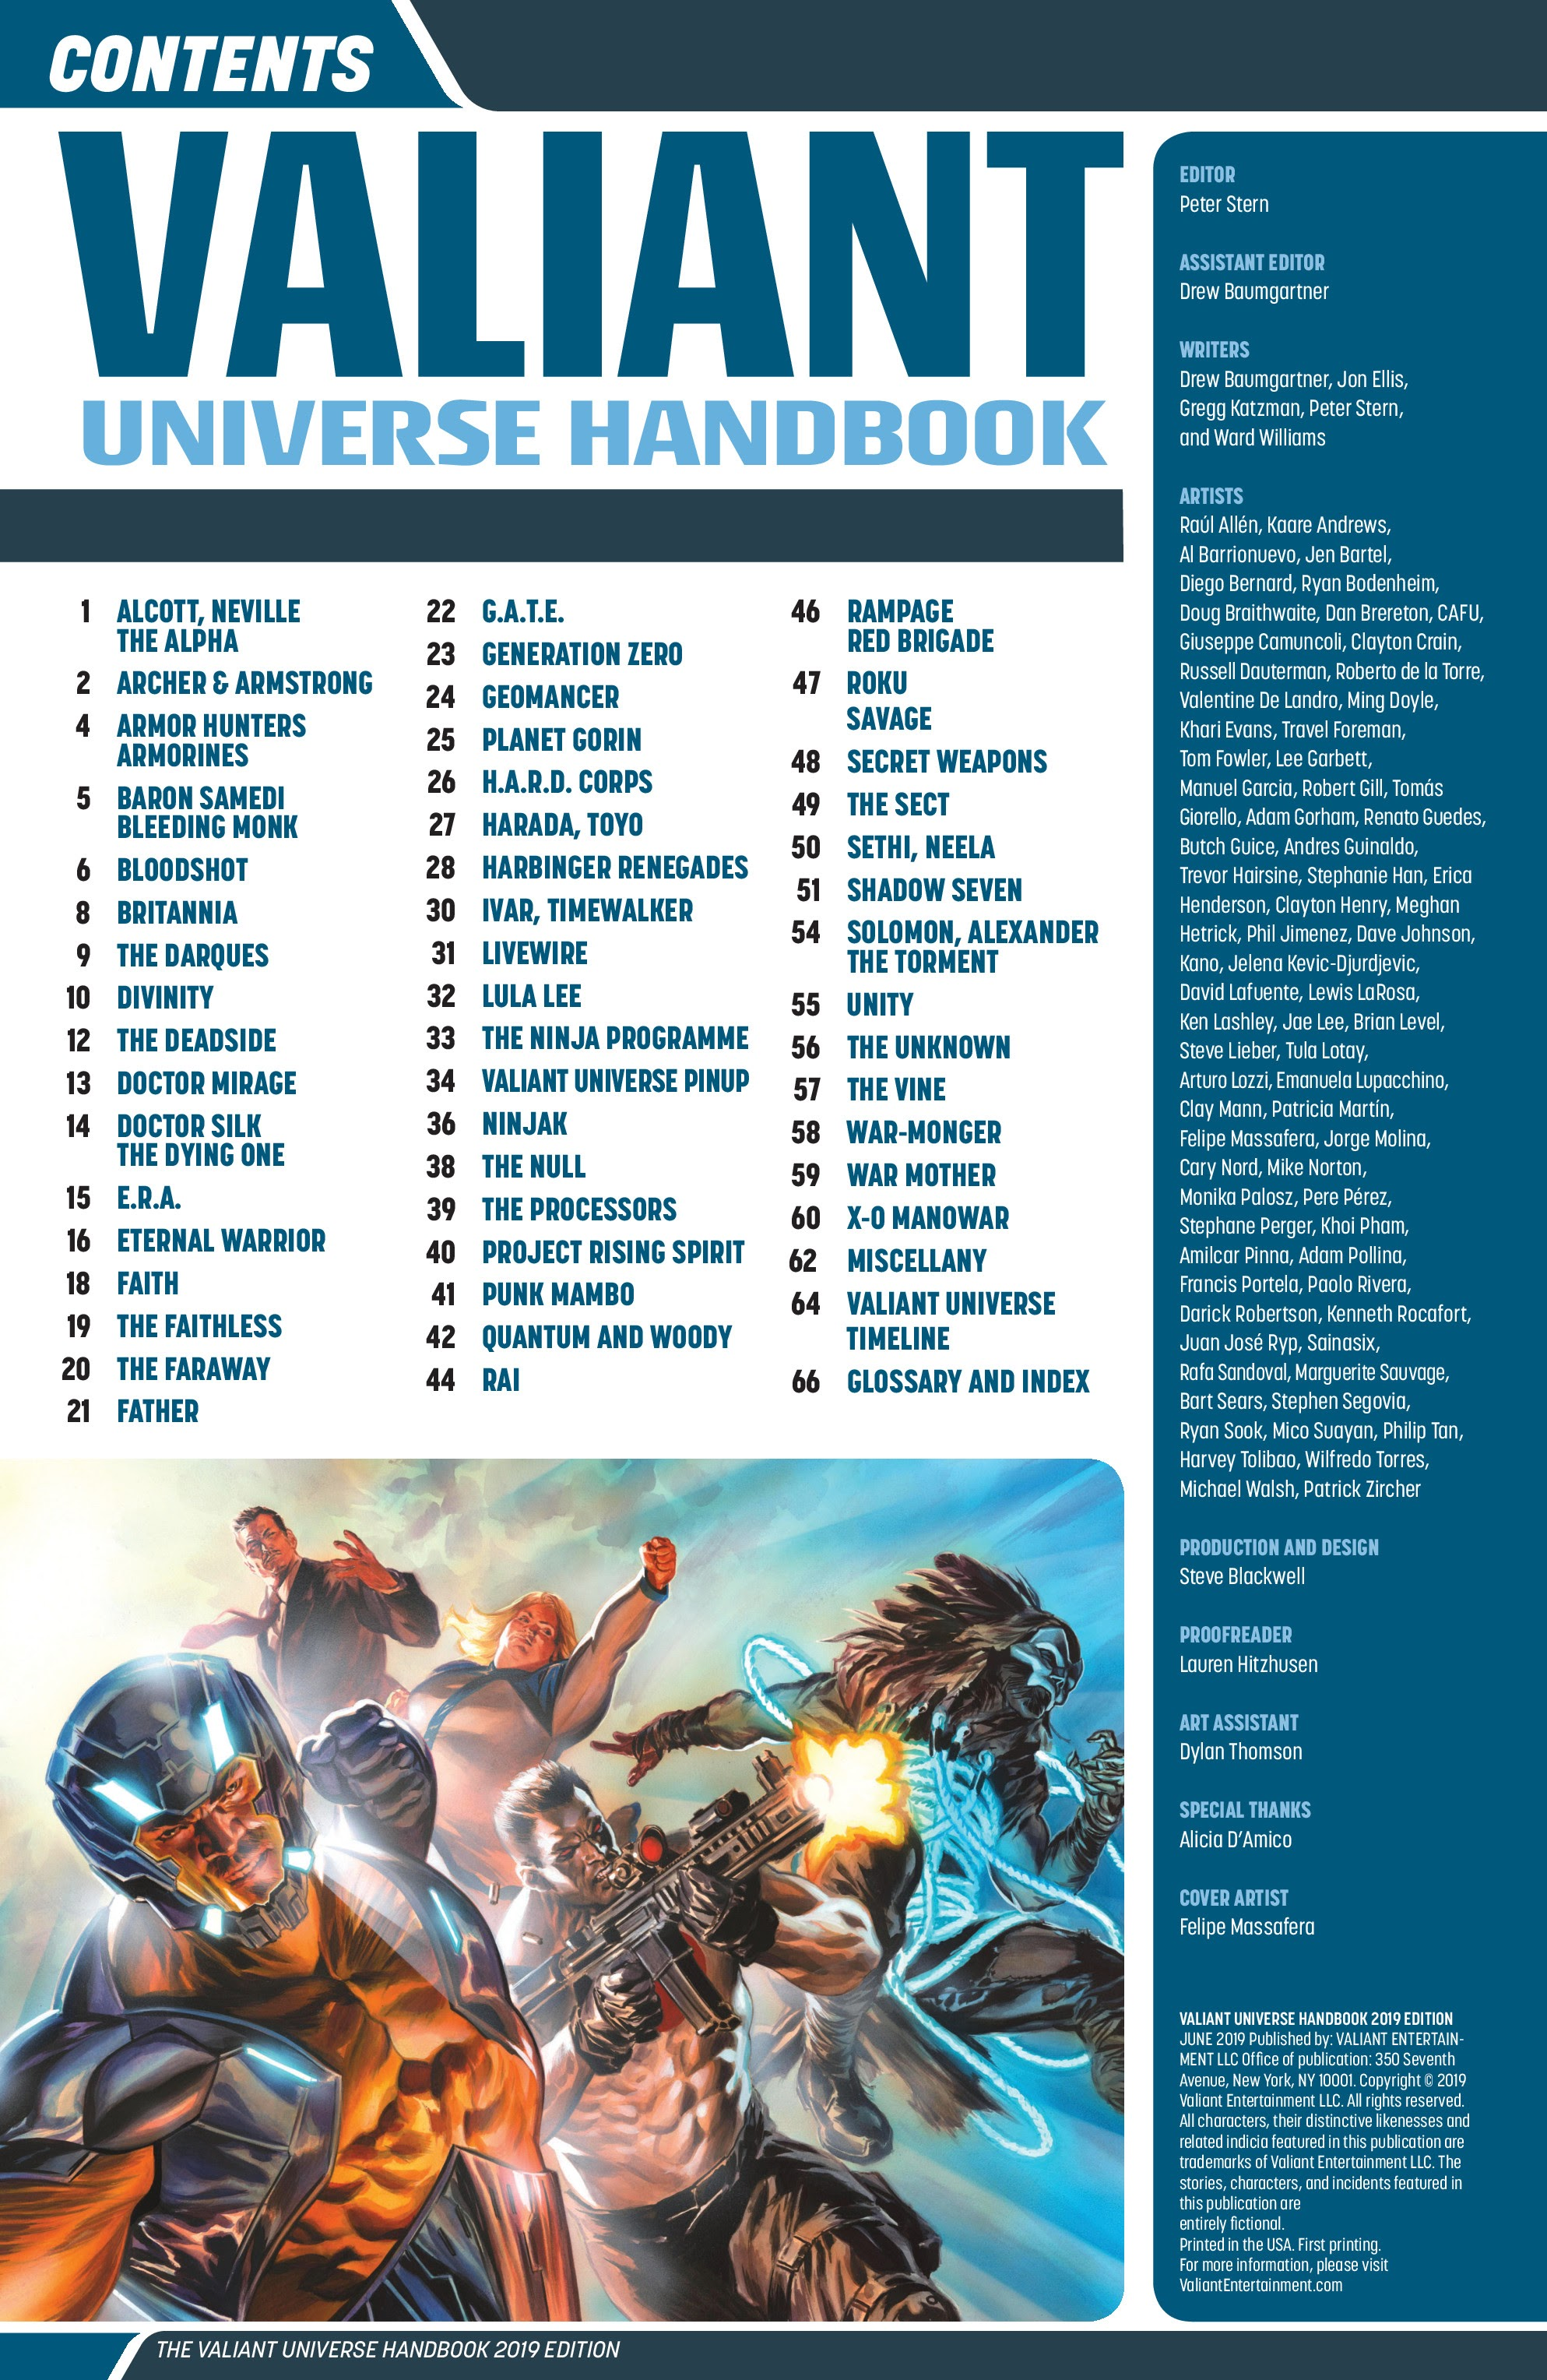 Valiant Universe Handbook 2019 Edition Full | Viewcomic